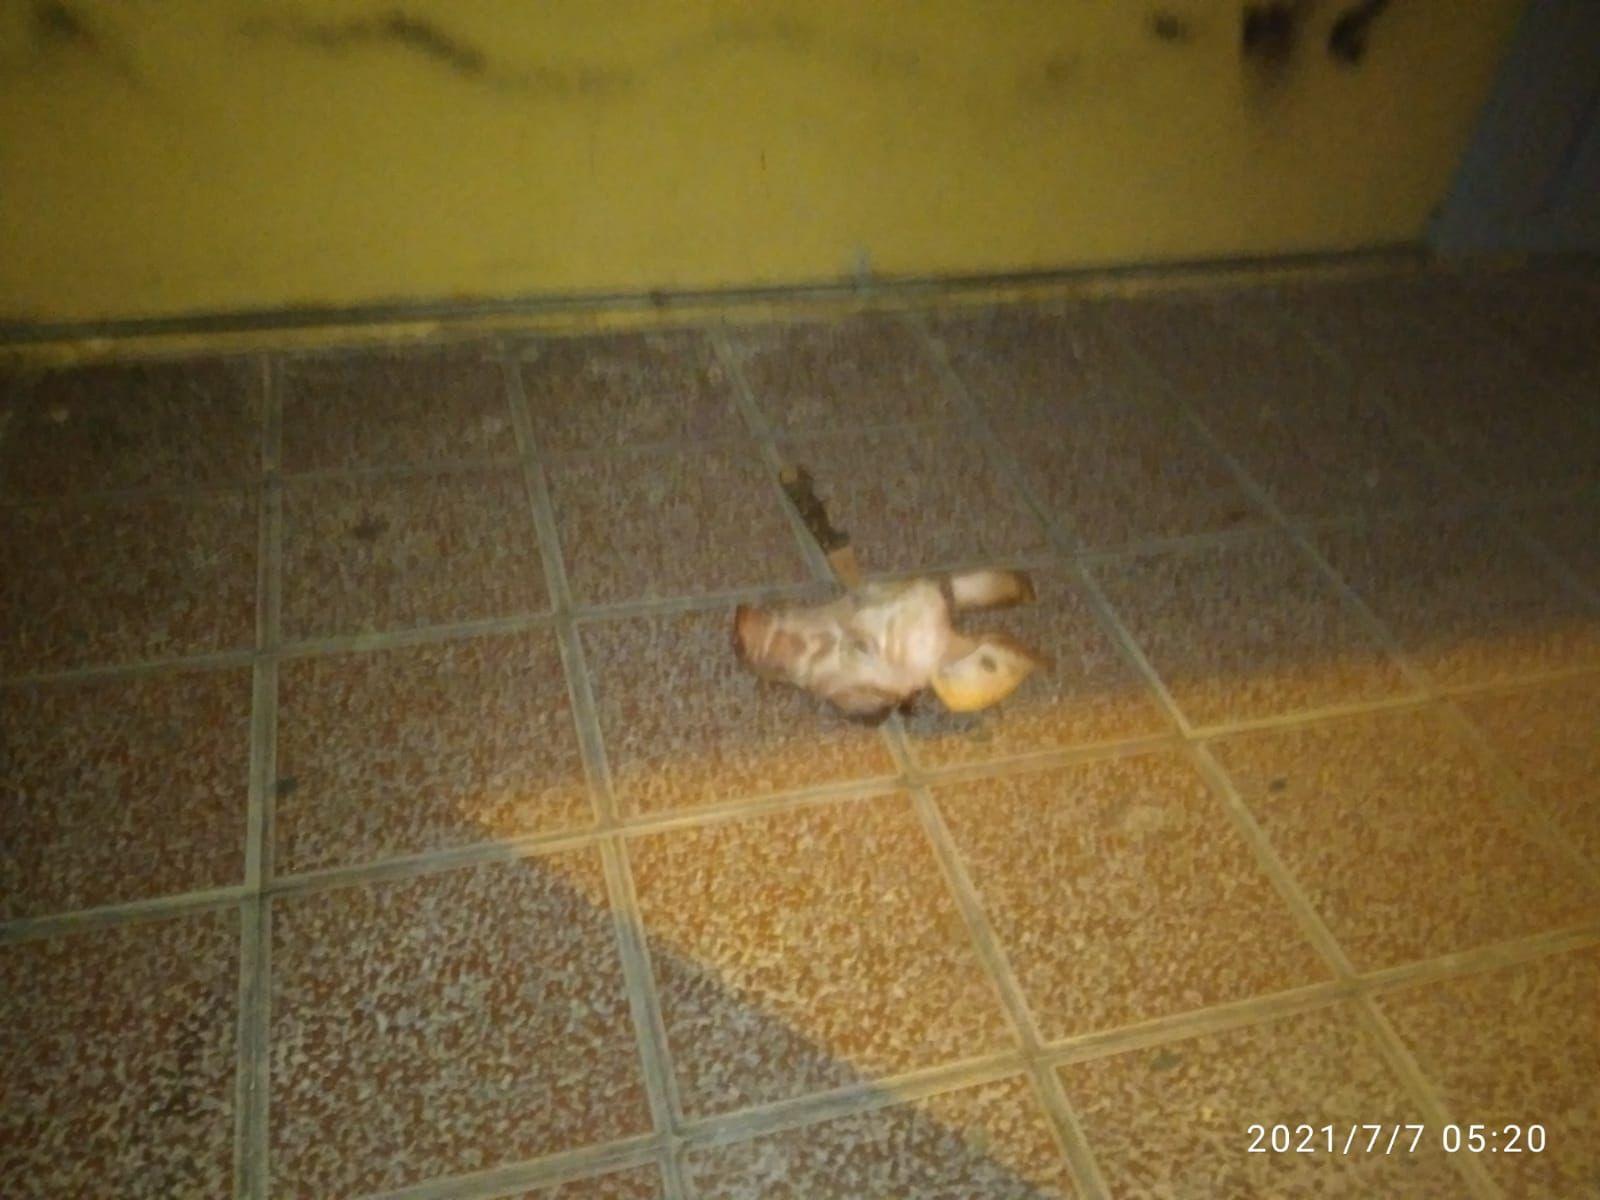 Cabeza de cerdo lanzada a la mezquita.